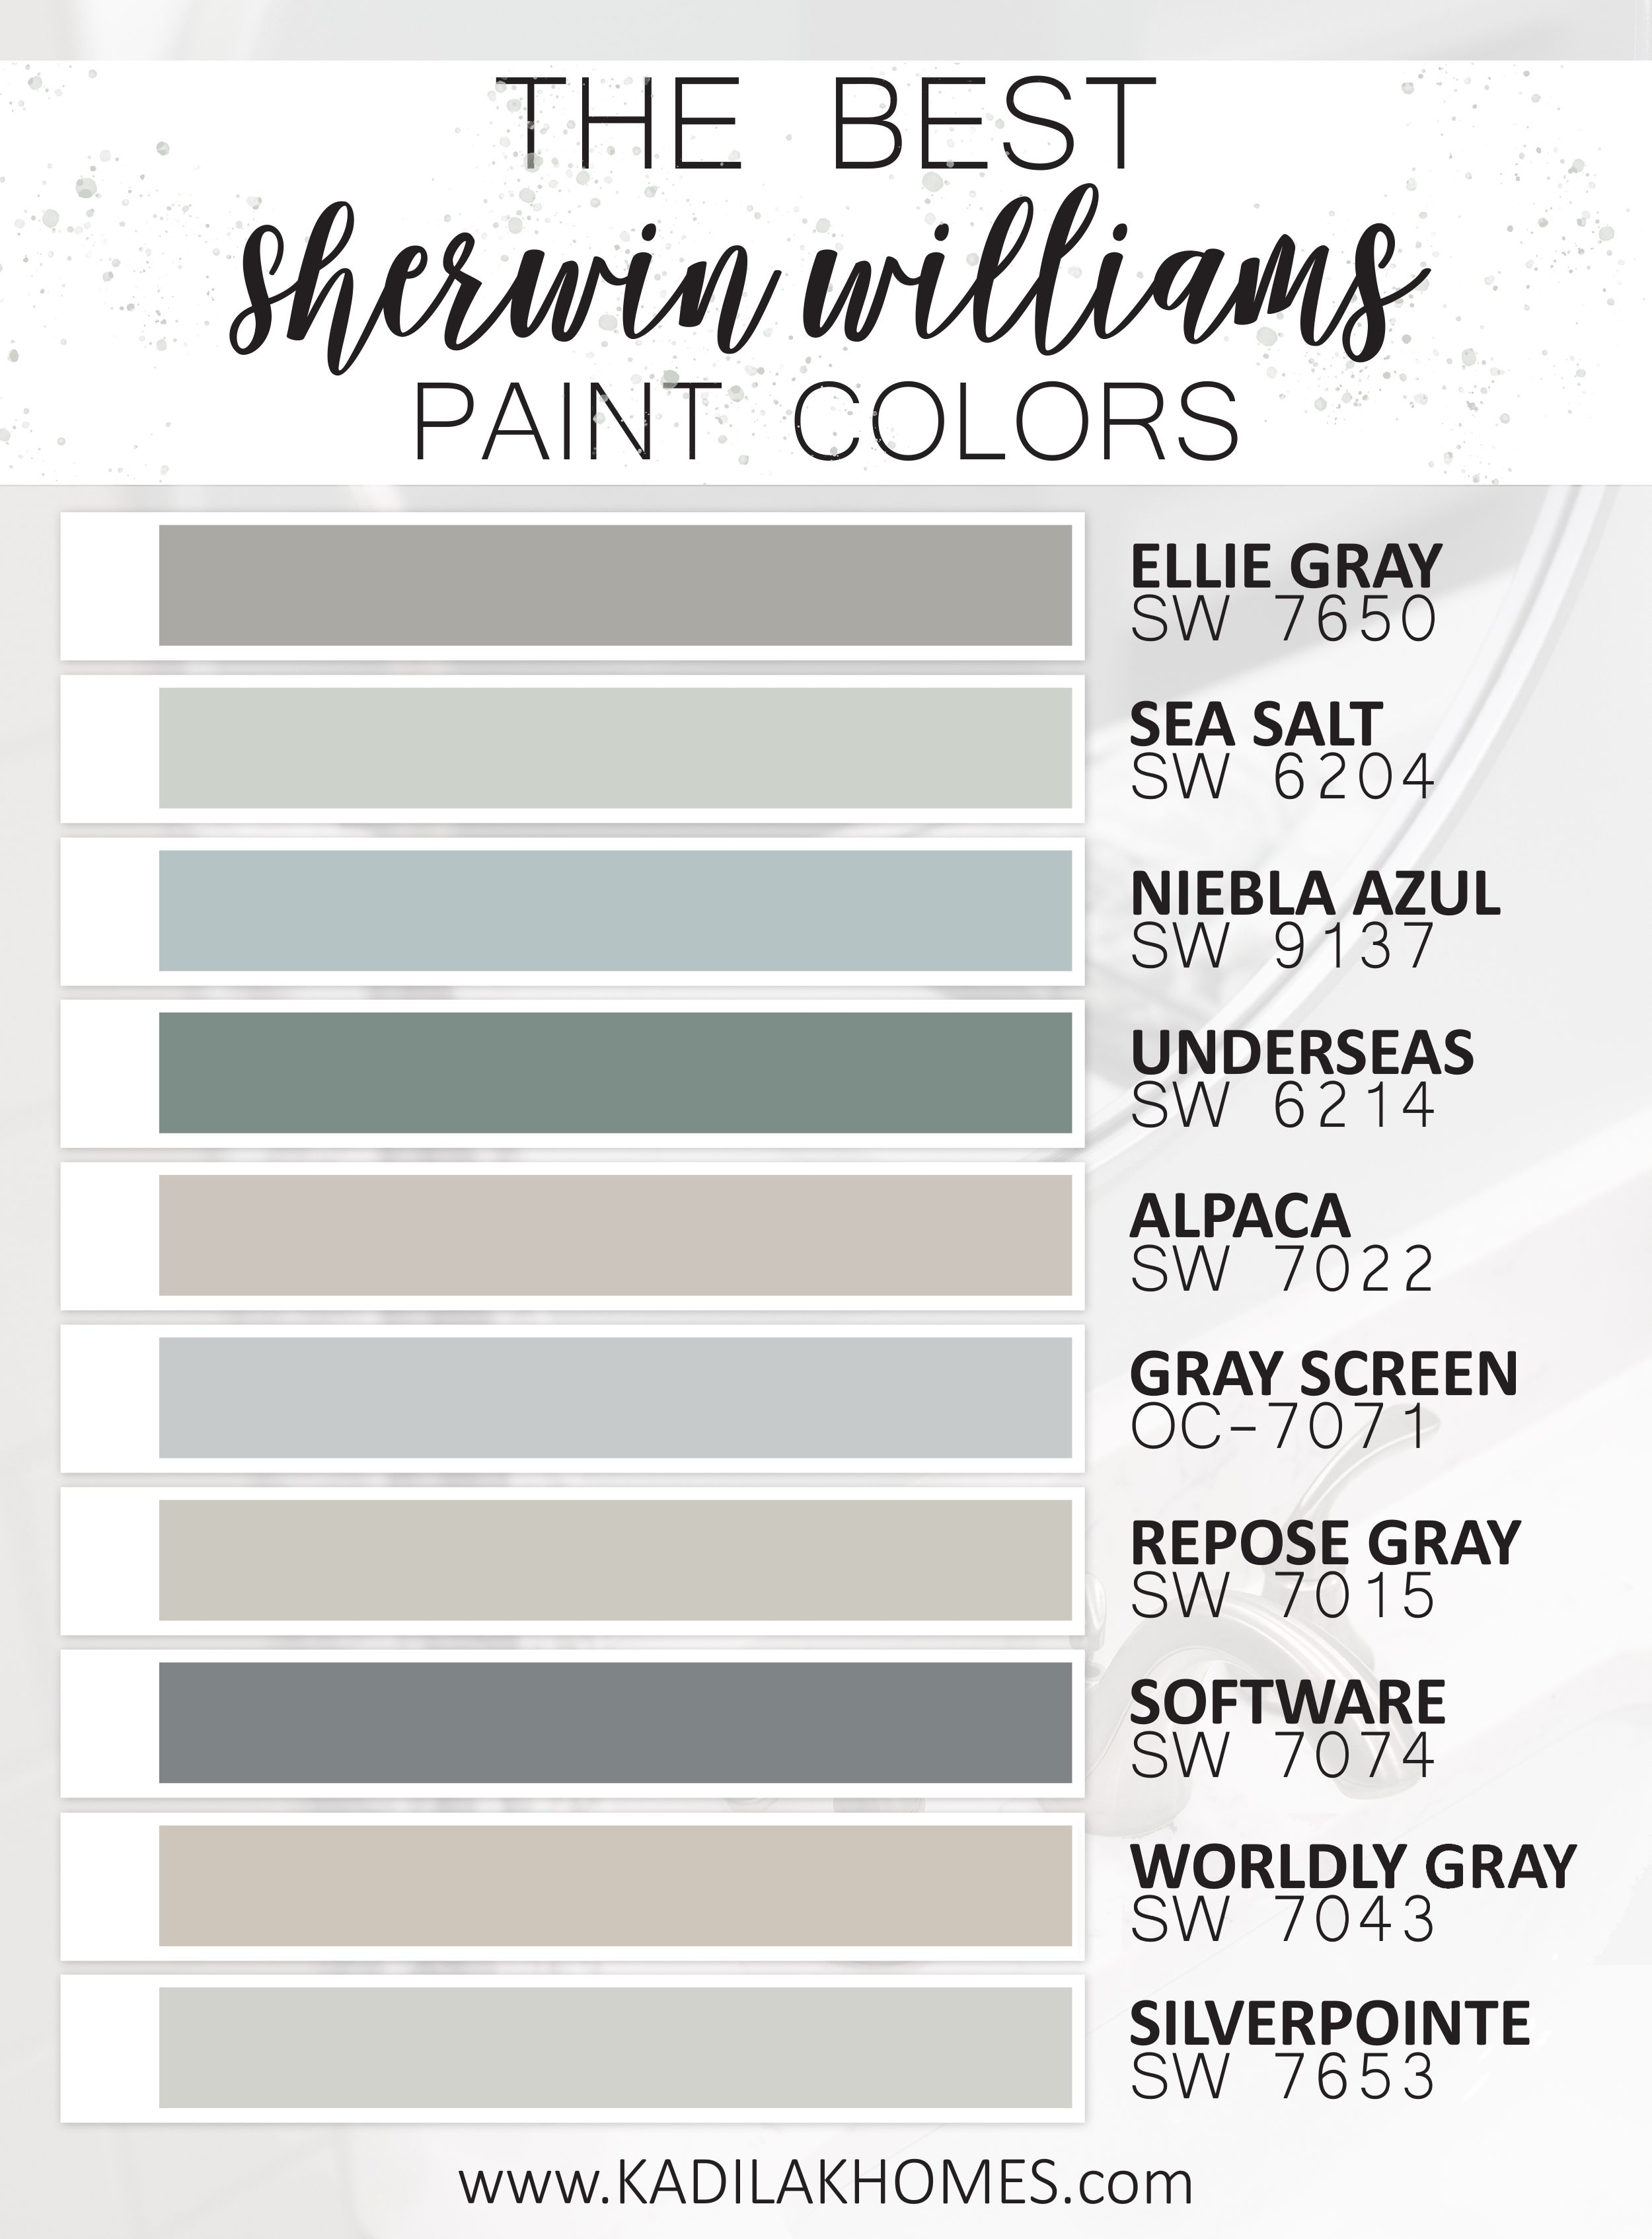 Sherwin Williams Paint | Top 10 Paint Colors!